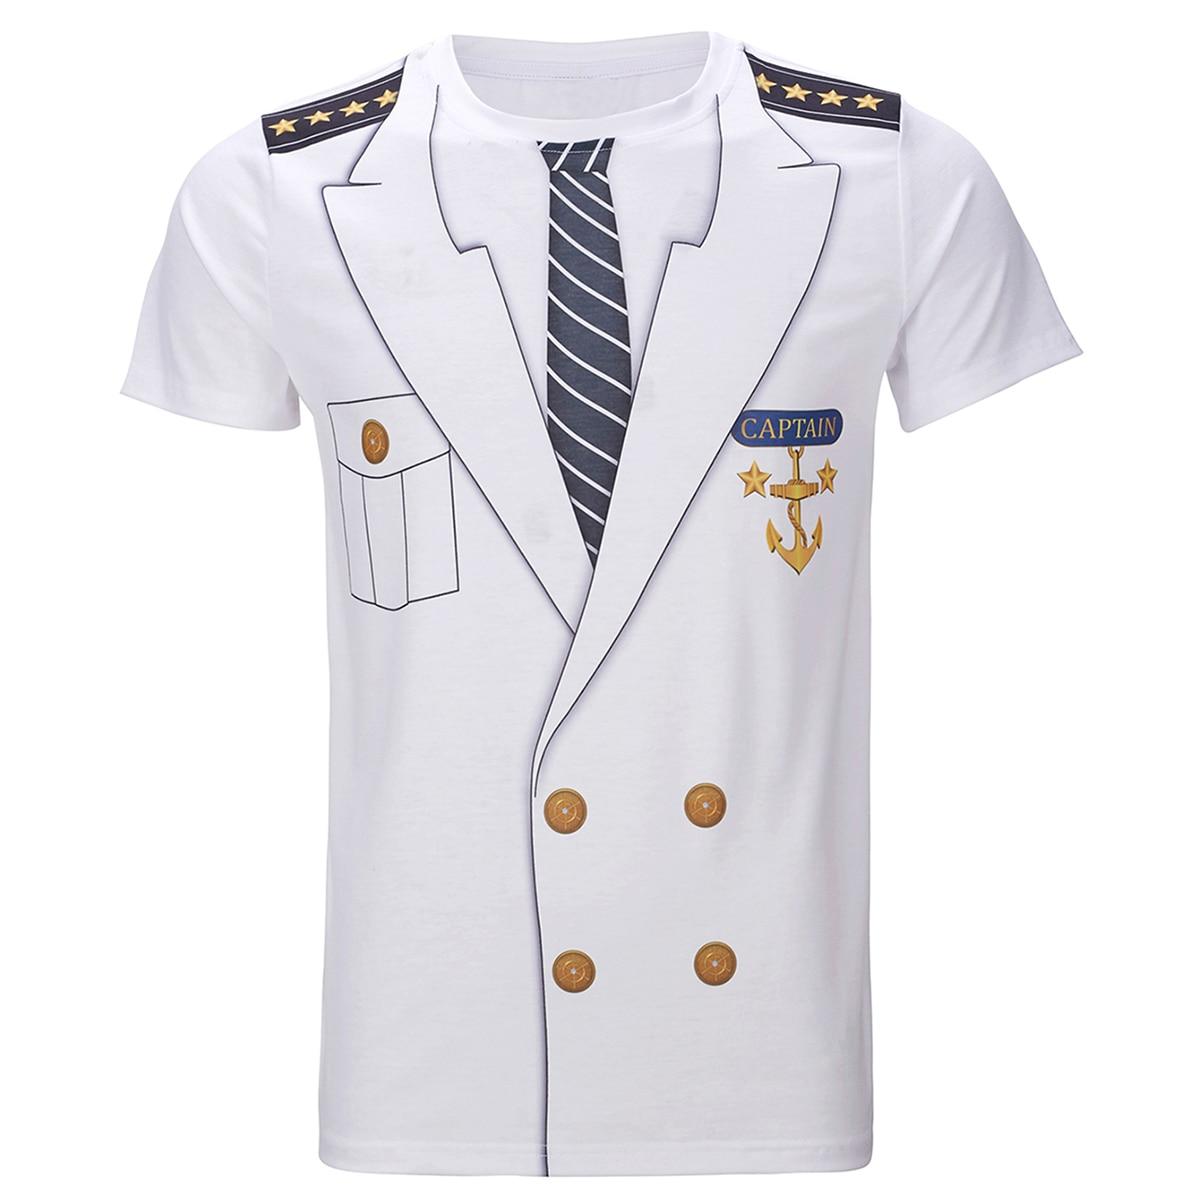 Men's Captain Costume T-Shirts Funny Cosplay Halloween Christmas Tee Adult Man Top Cowboy Pilot Uniform Carnival 3D Plus Size